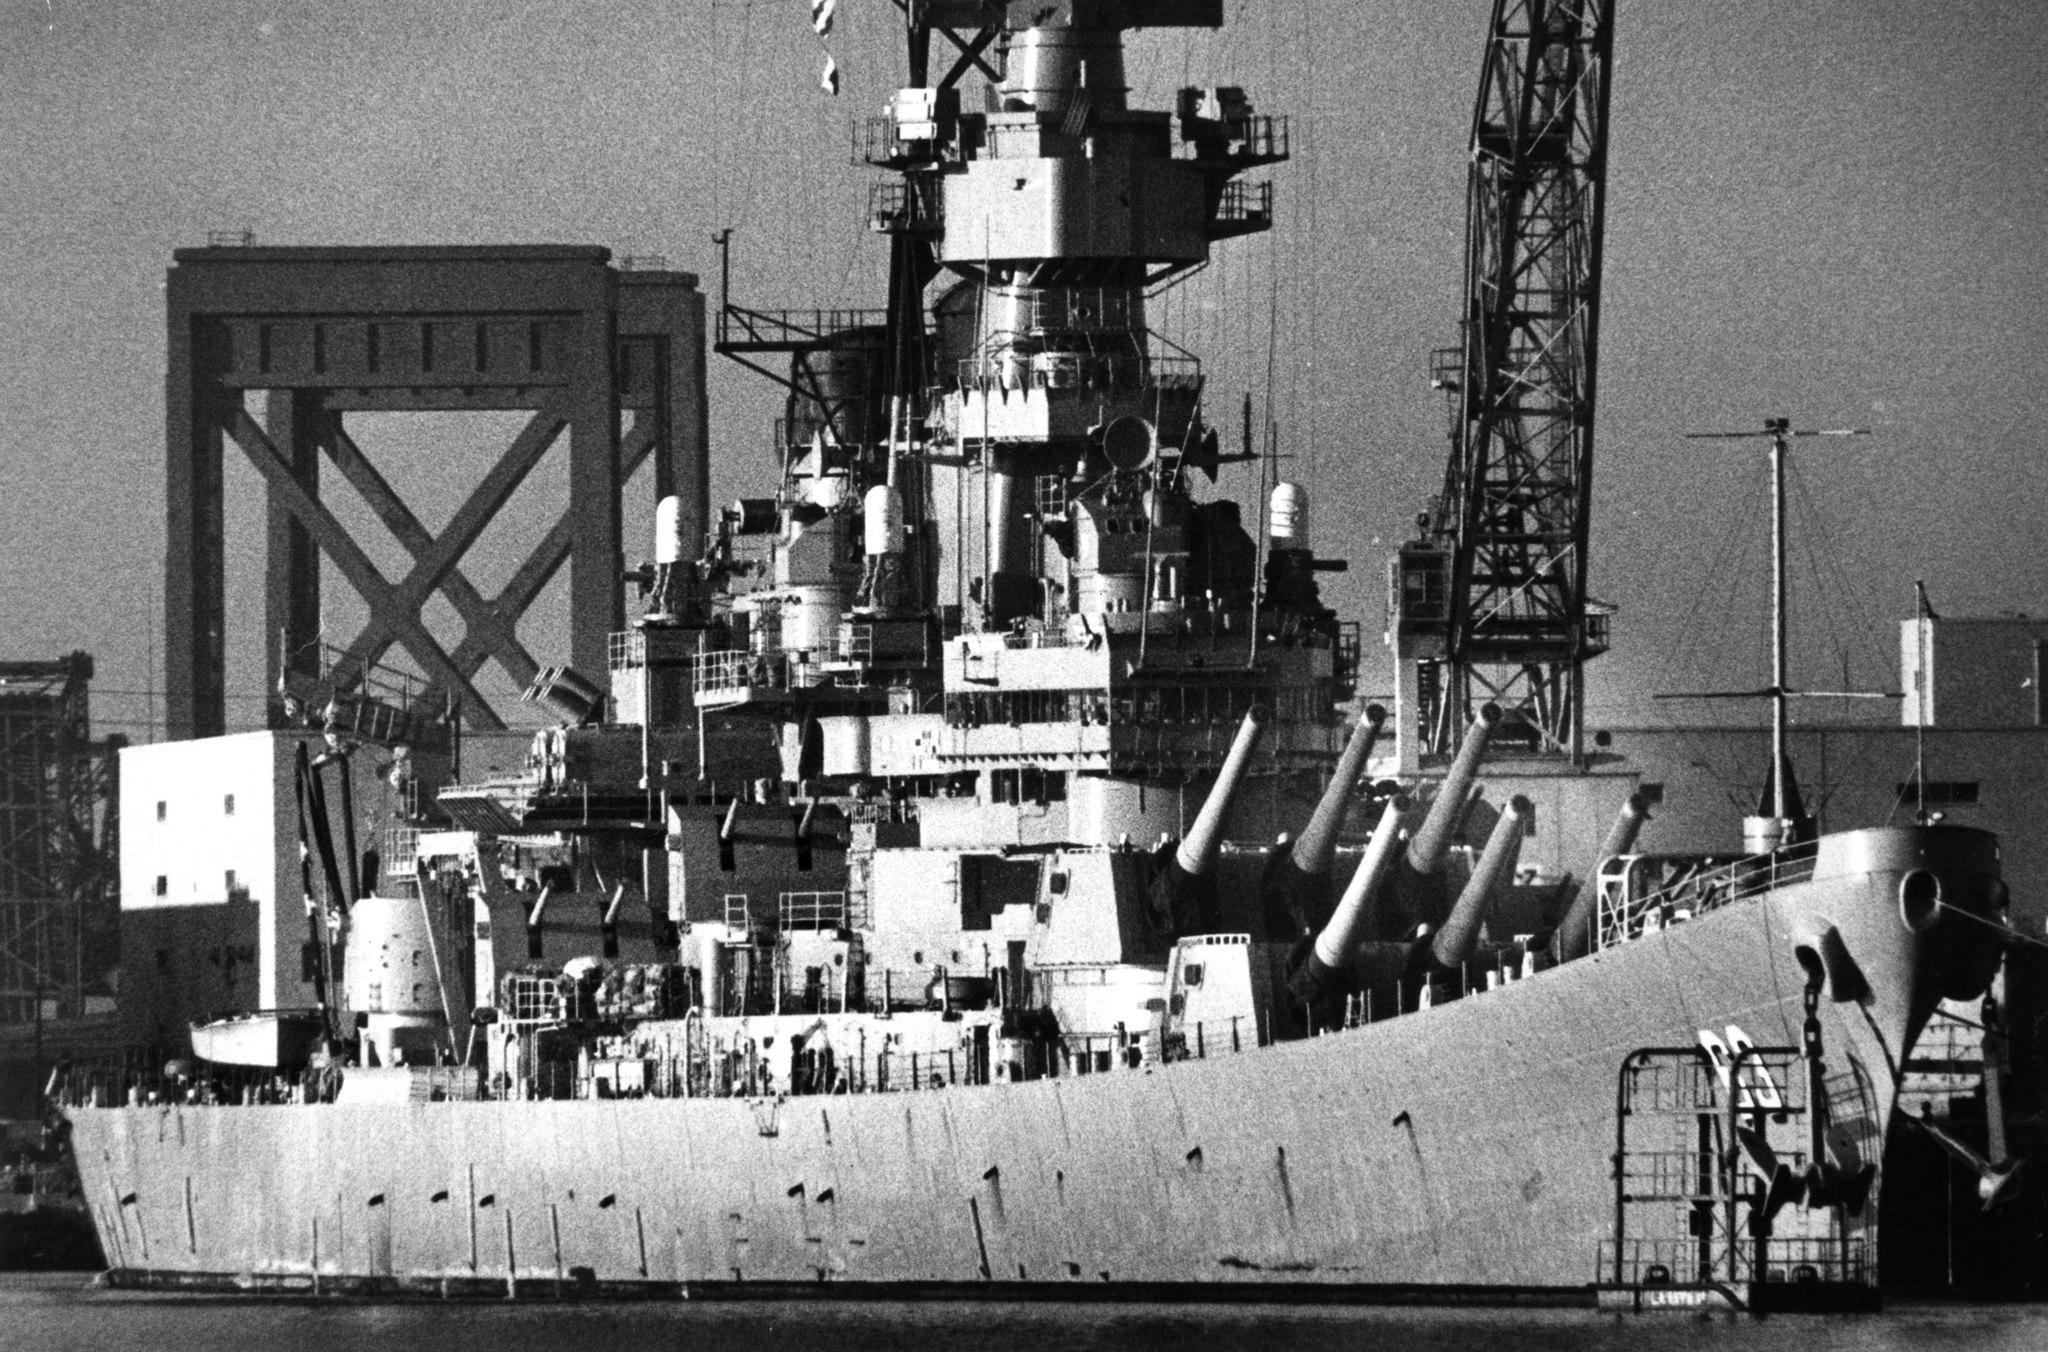 Nov. 15, 1989: The battleship USS Missouri docked at the Long Beach Naval Station.